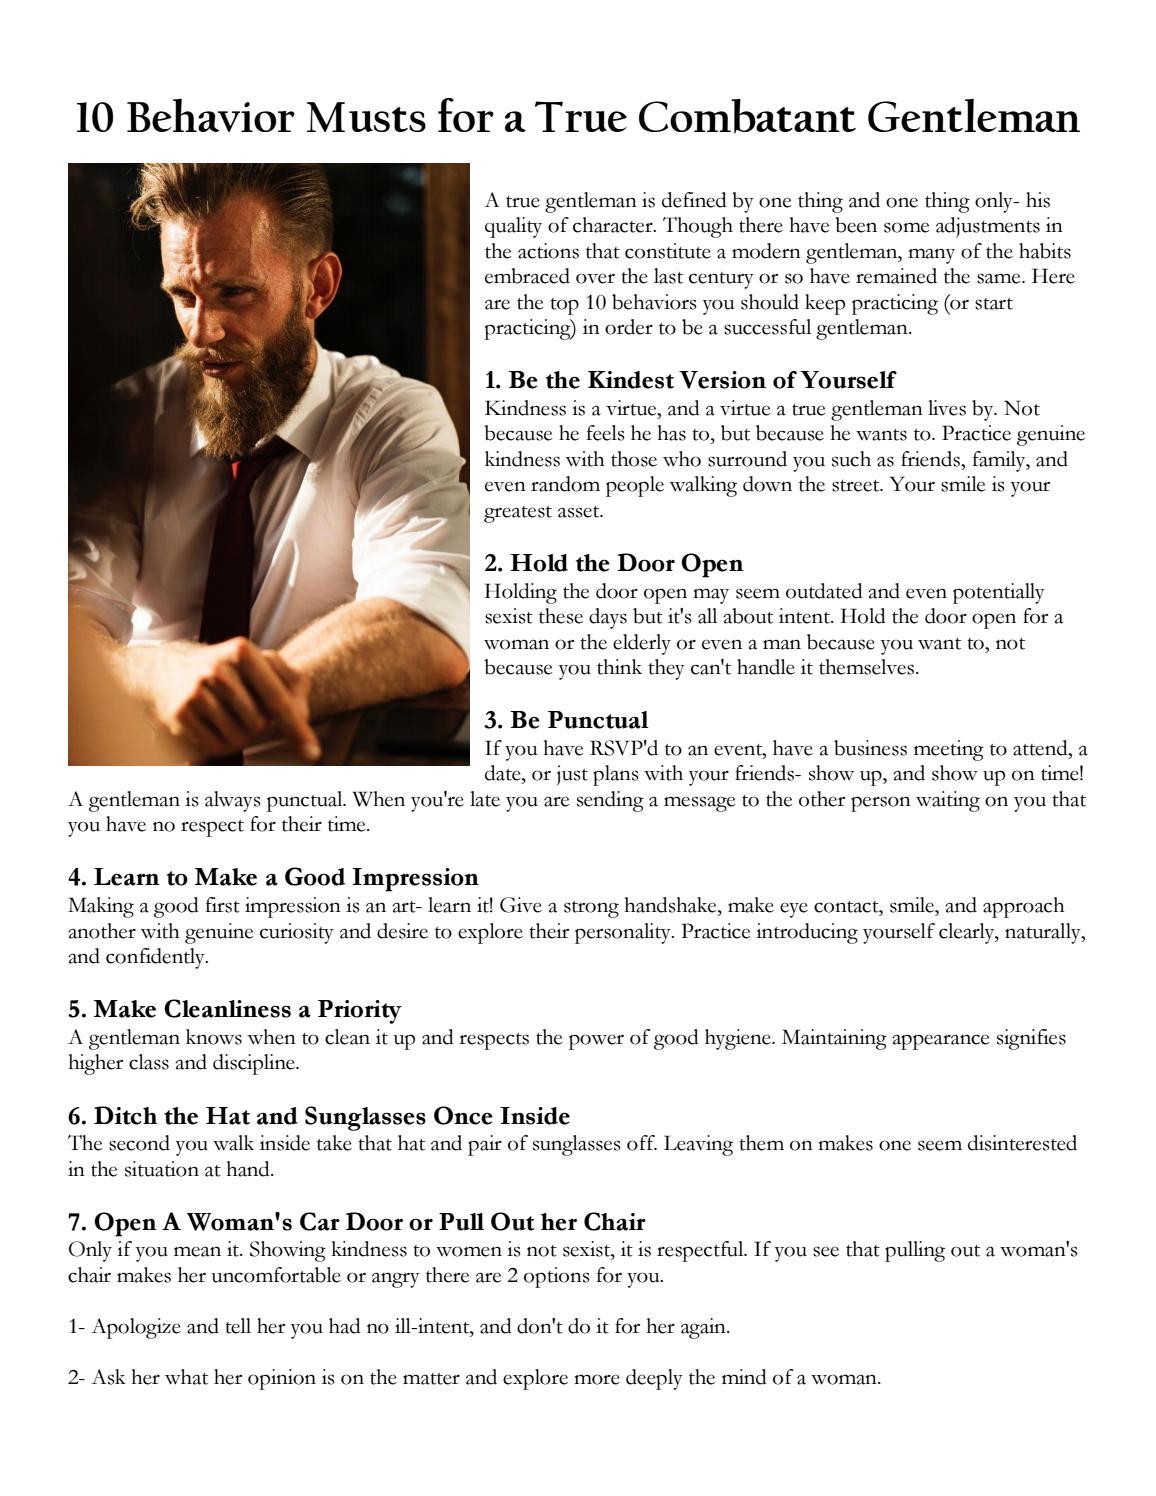 10 Behavior Musts for a True Combatant Gentleman by